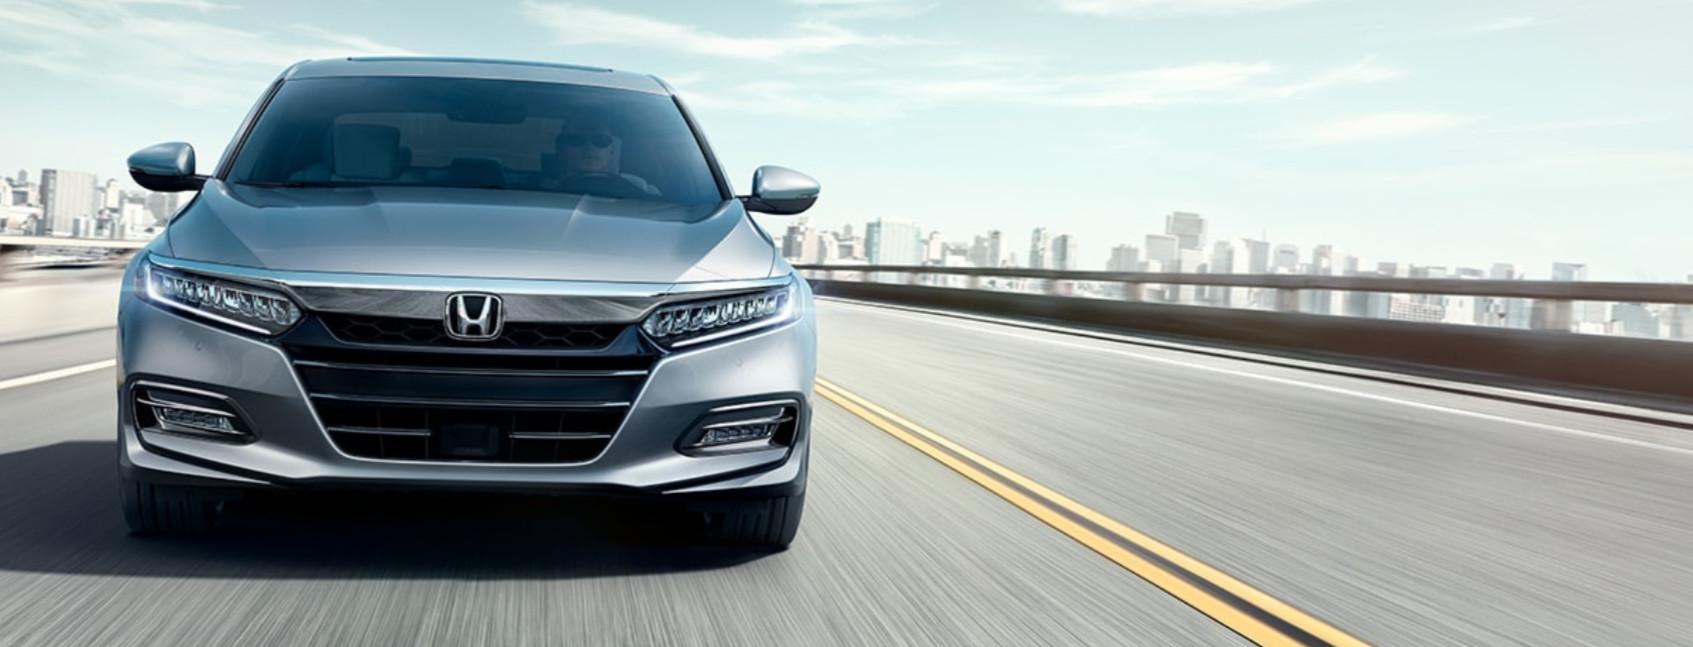 2020 Honda Accord Leasing near Kingwood, TX